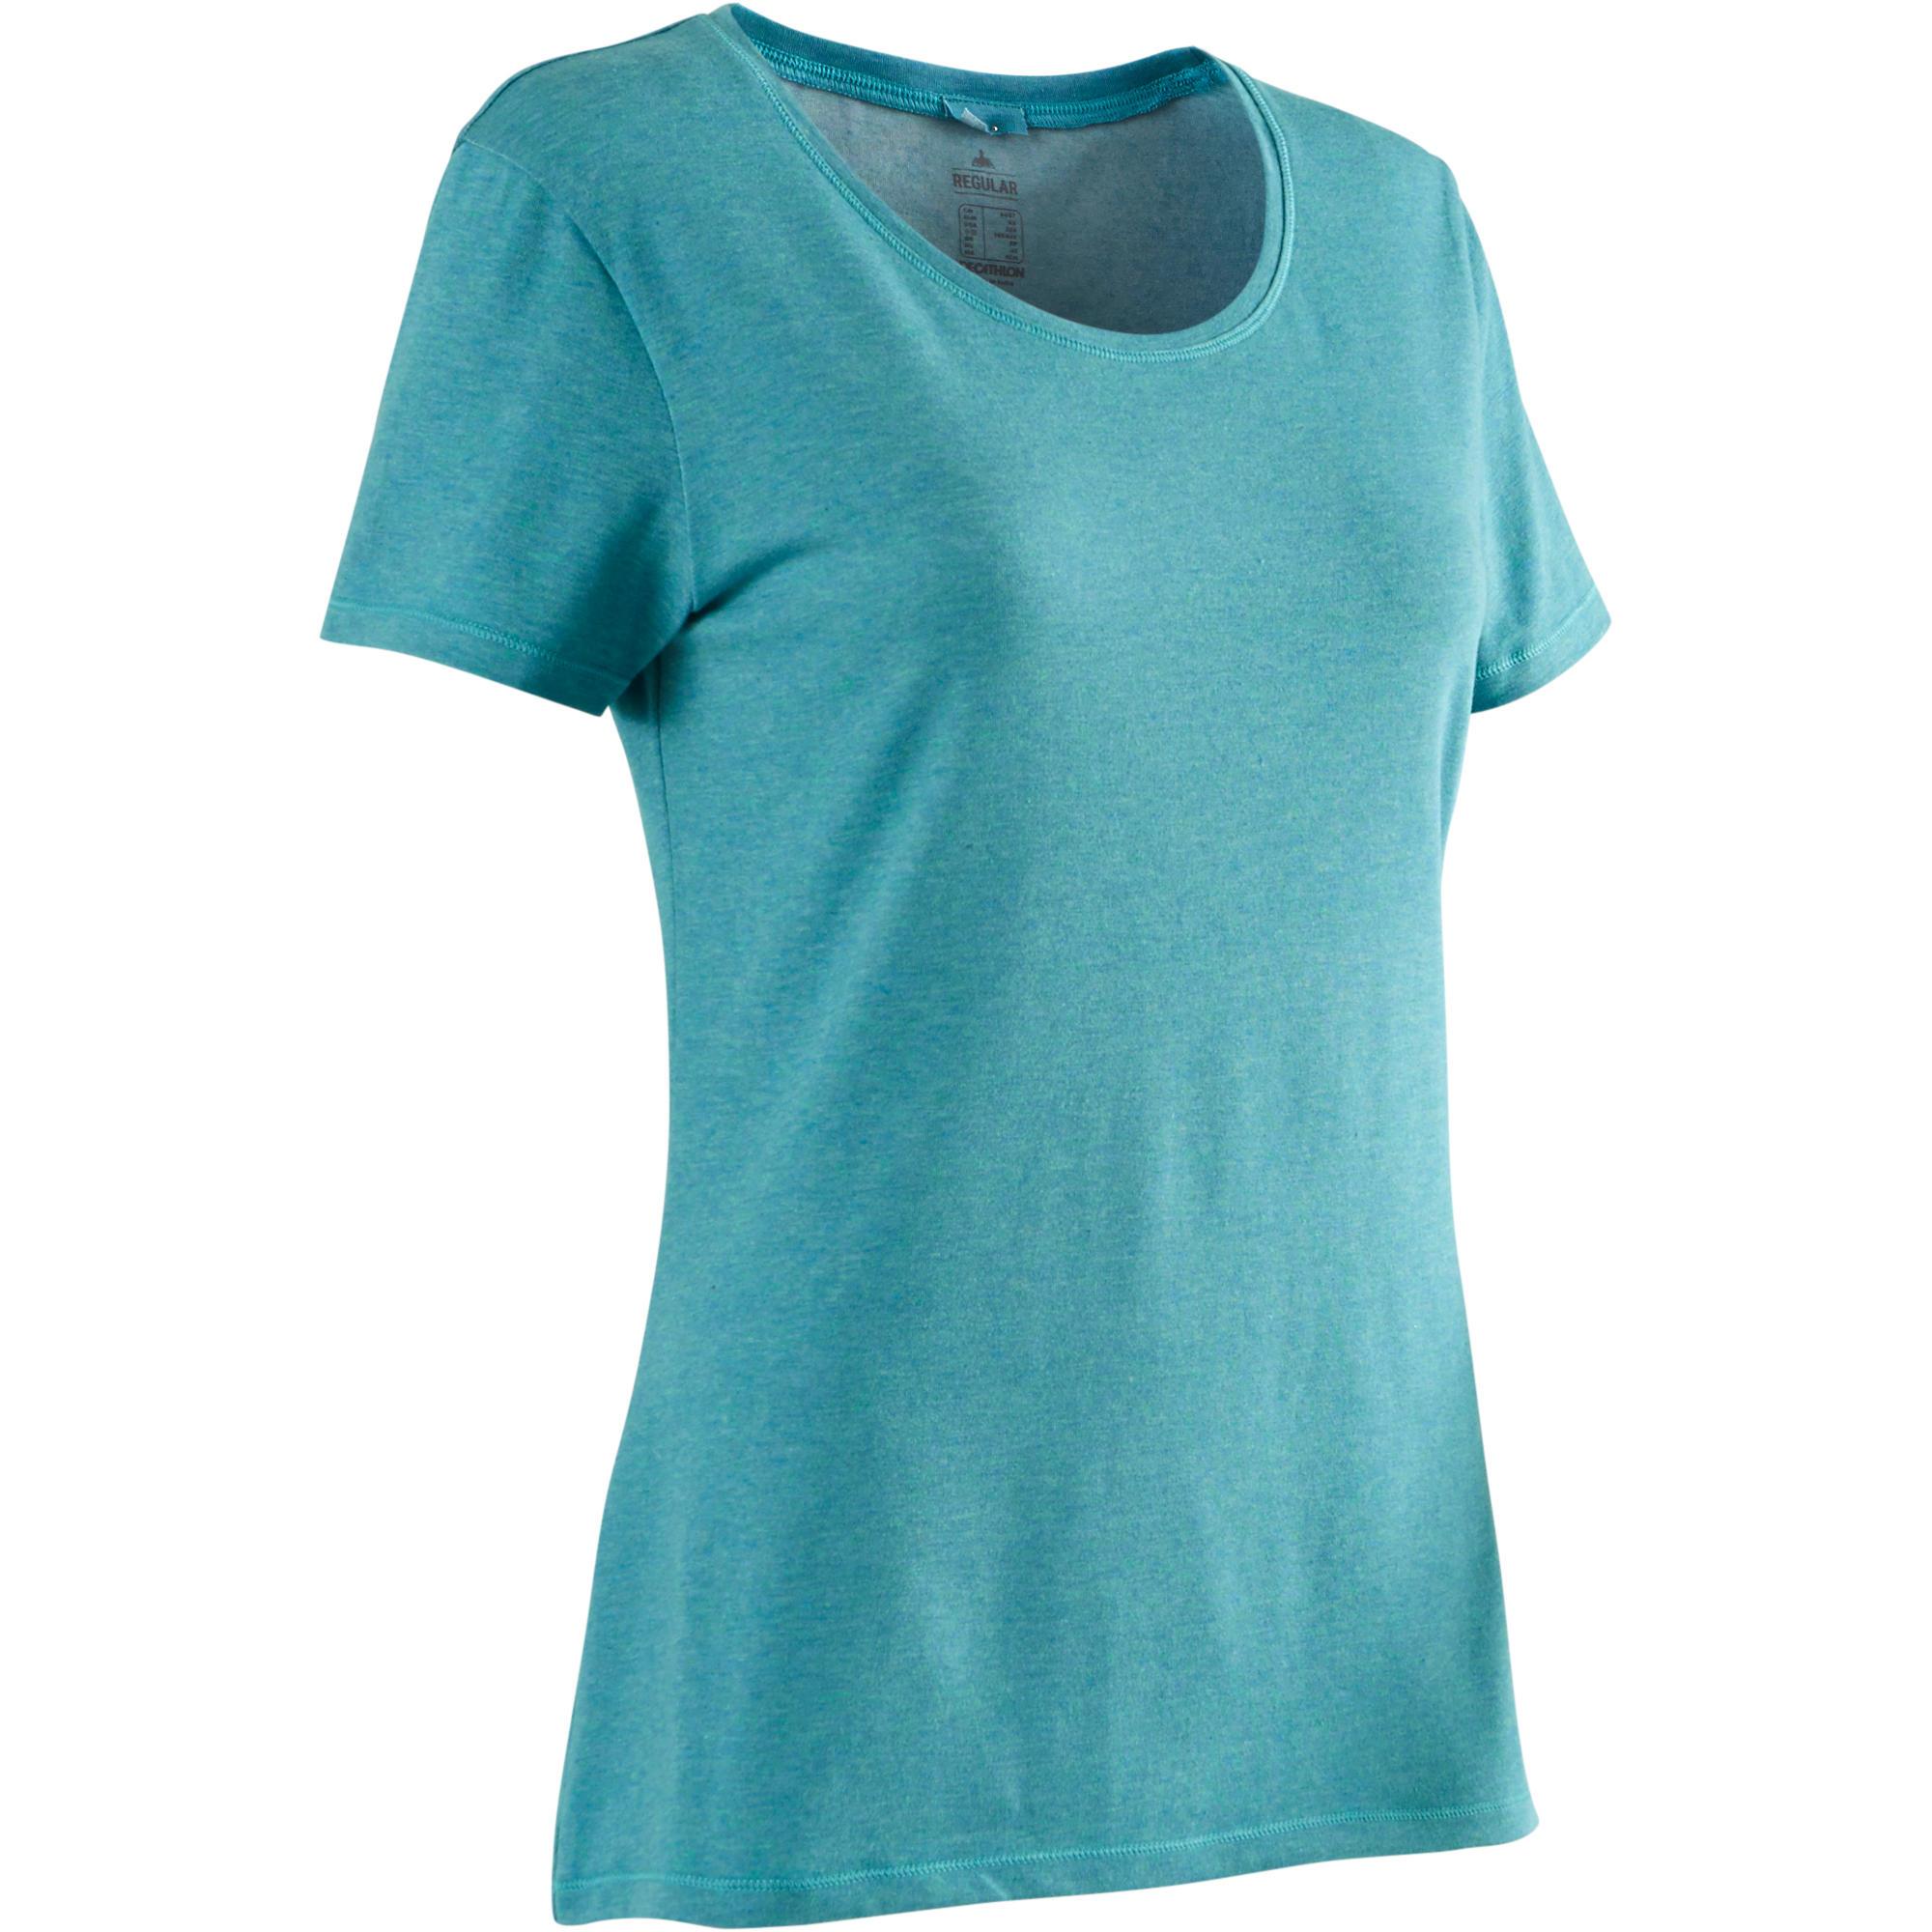 T-Shirt 500 Regular Gym & Pilates Damen grün meliert   Bekleidung > Shirts > T-Shirts   Blau - Türkis   Domyos